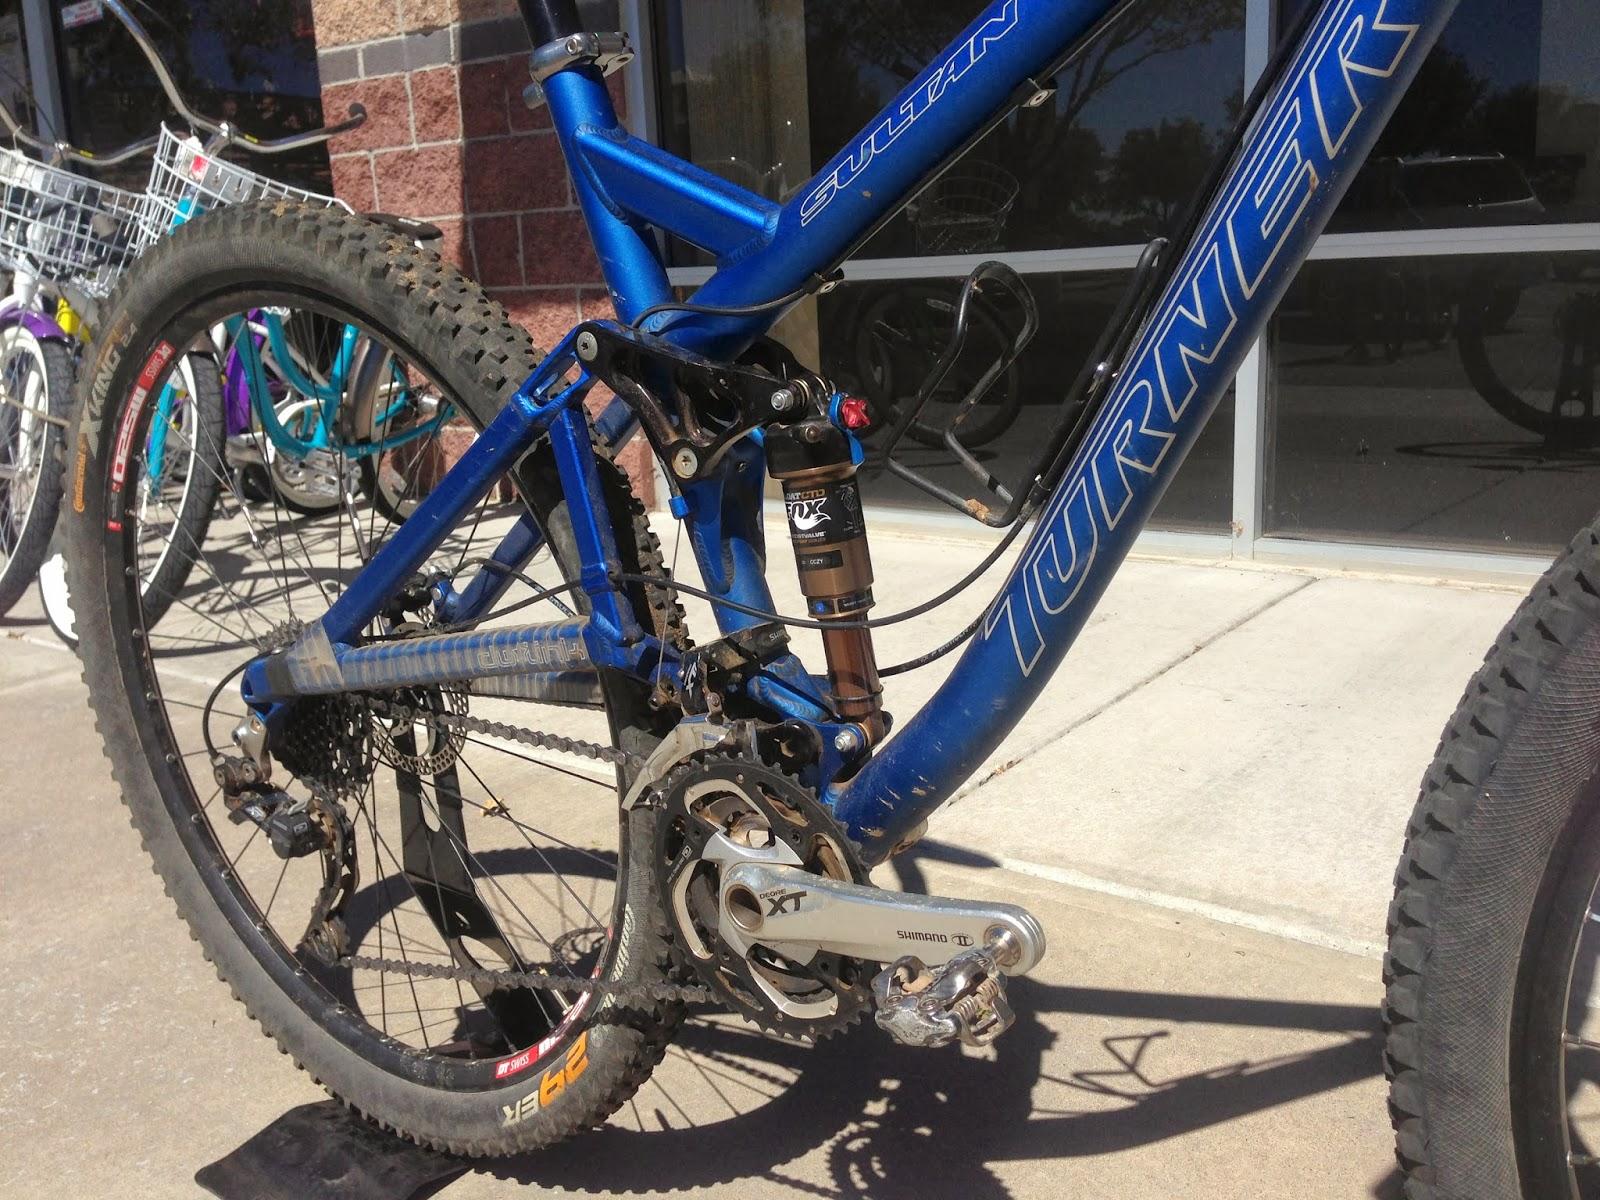 BikeworksABQ | The Great 2013 Demo Bike Sell Off! Turner